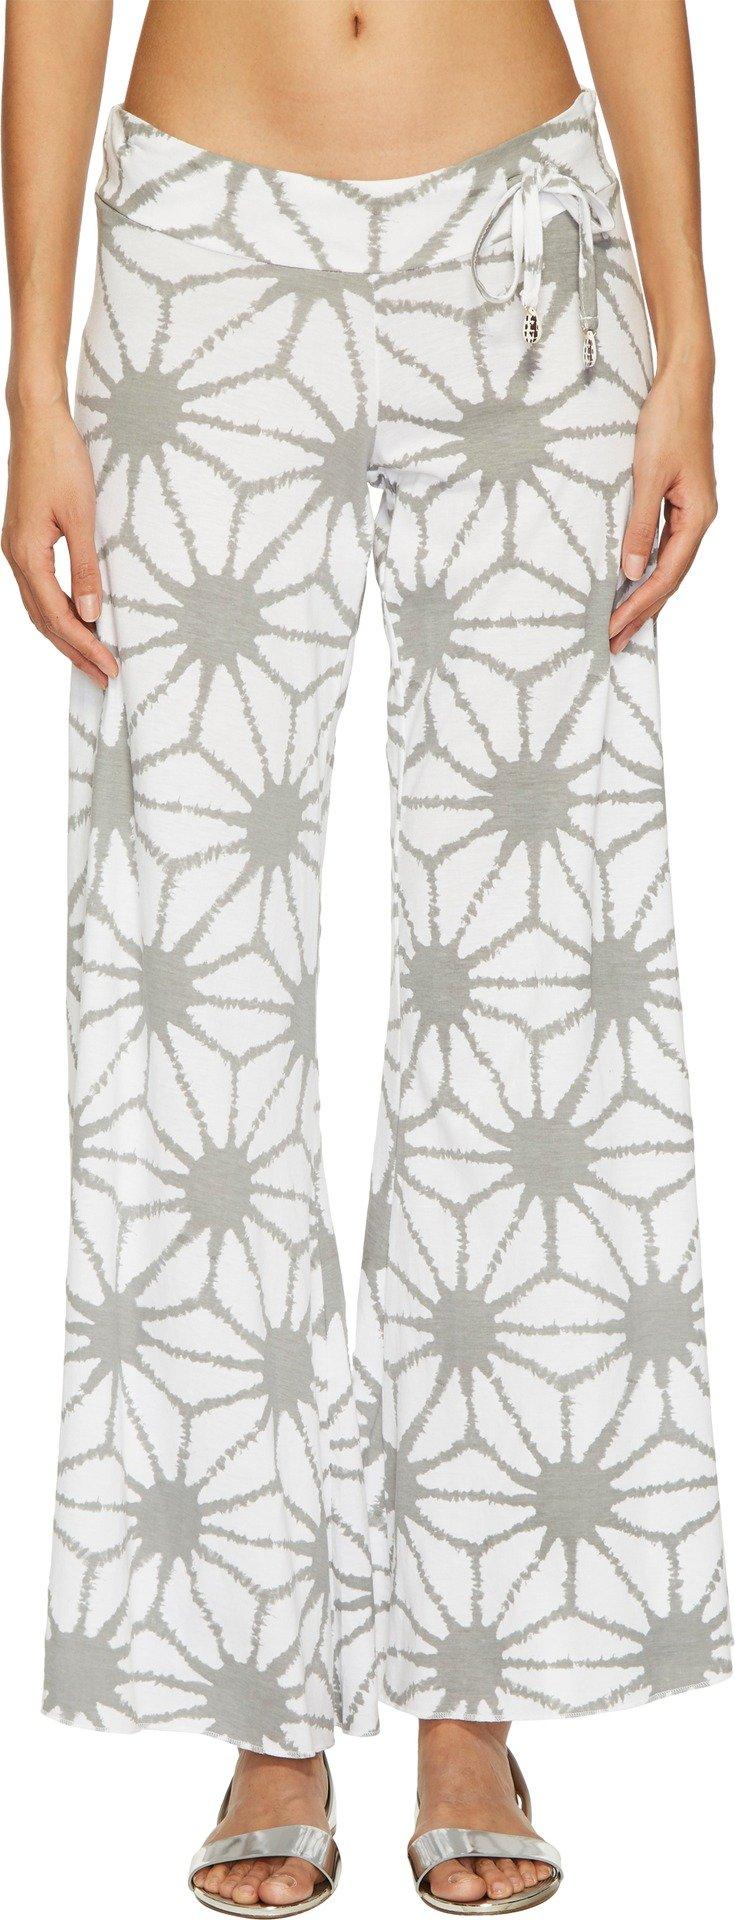 Letarte Women's Shibori Beach Pants Cover-Up Lt Grey Multi X-Small